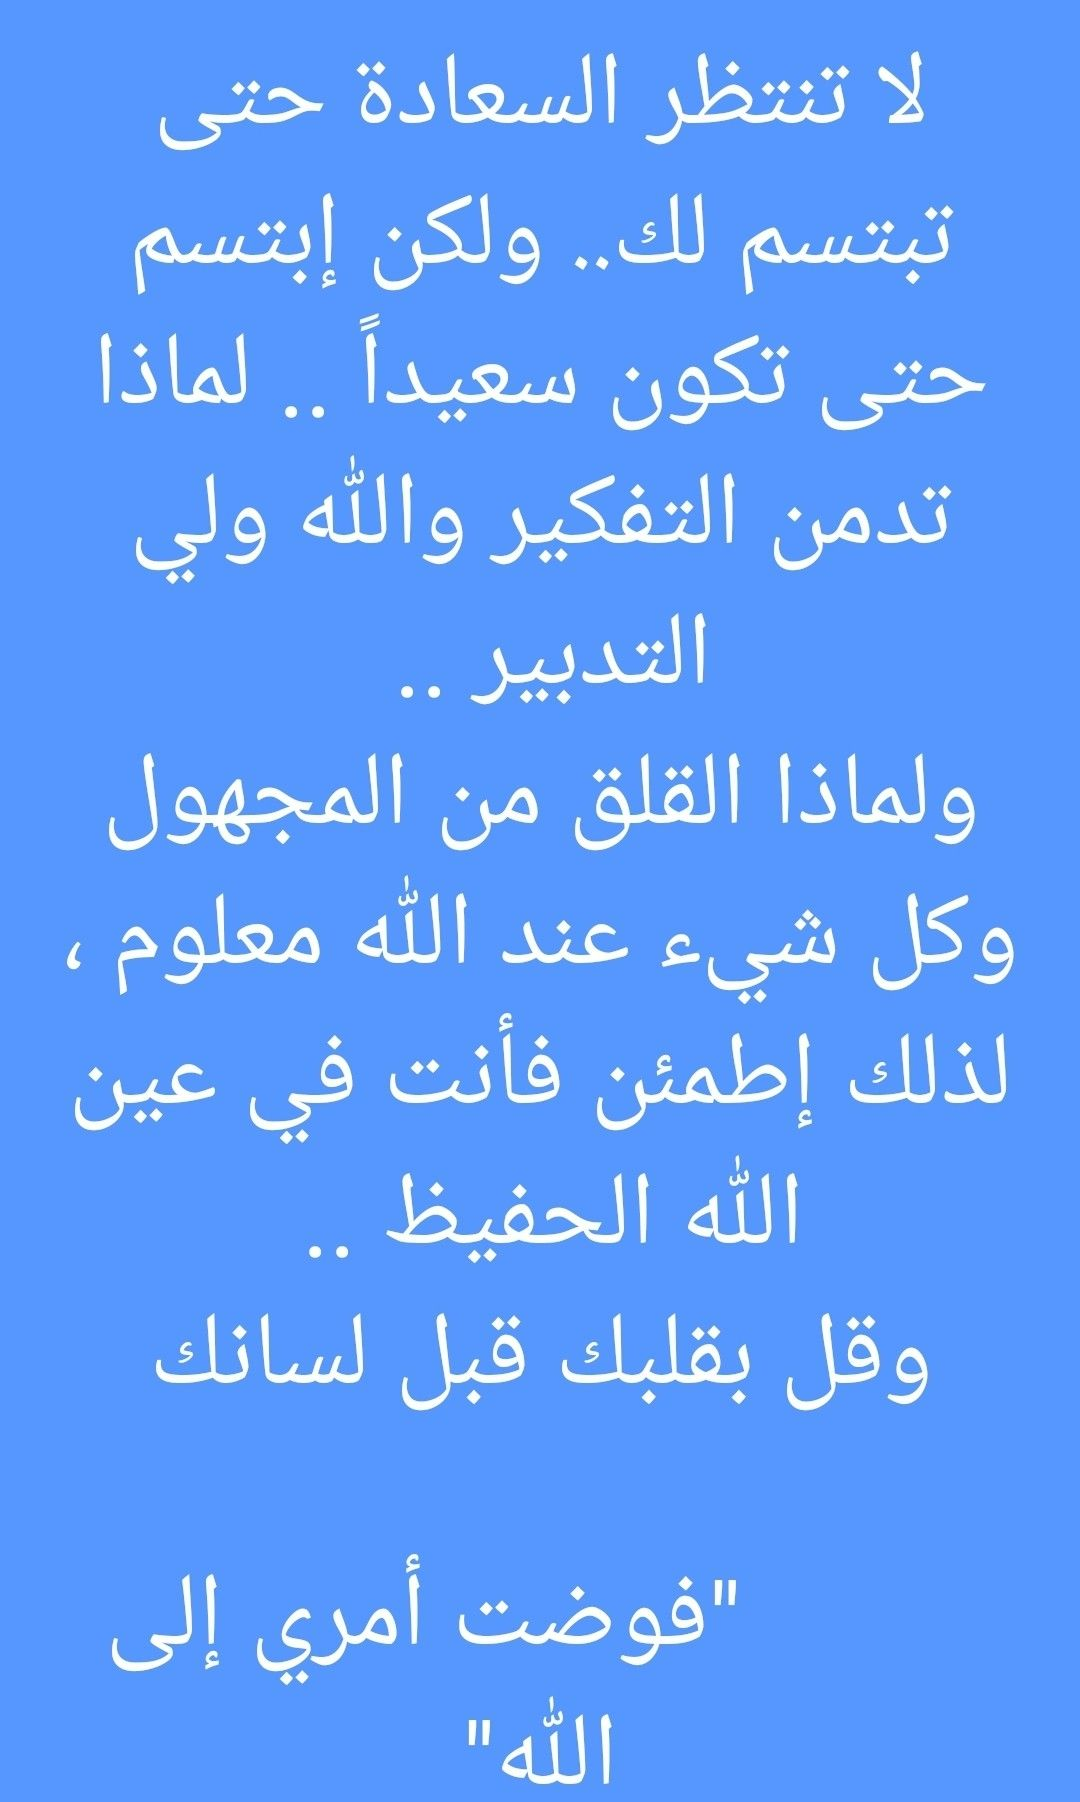 Pin By Um Alhasan On اسلاميات قرآن أحاديث دعاء همسات ايمانية Math Arabic Calligraphy